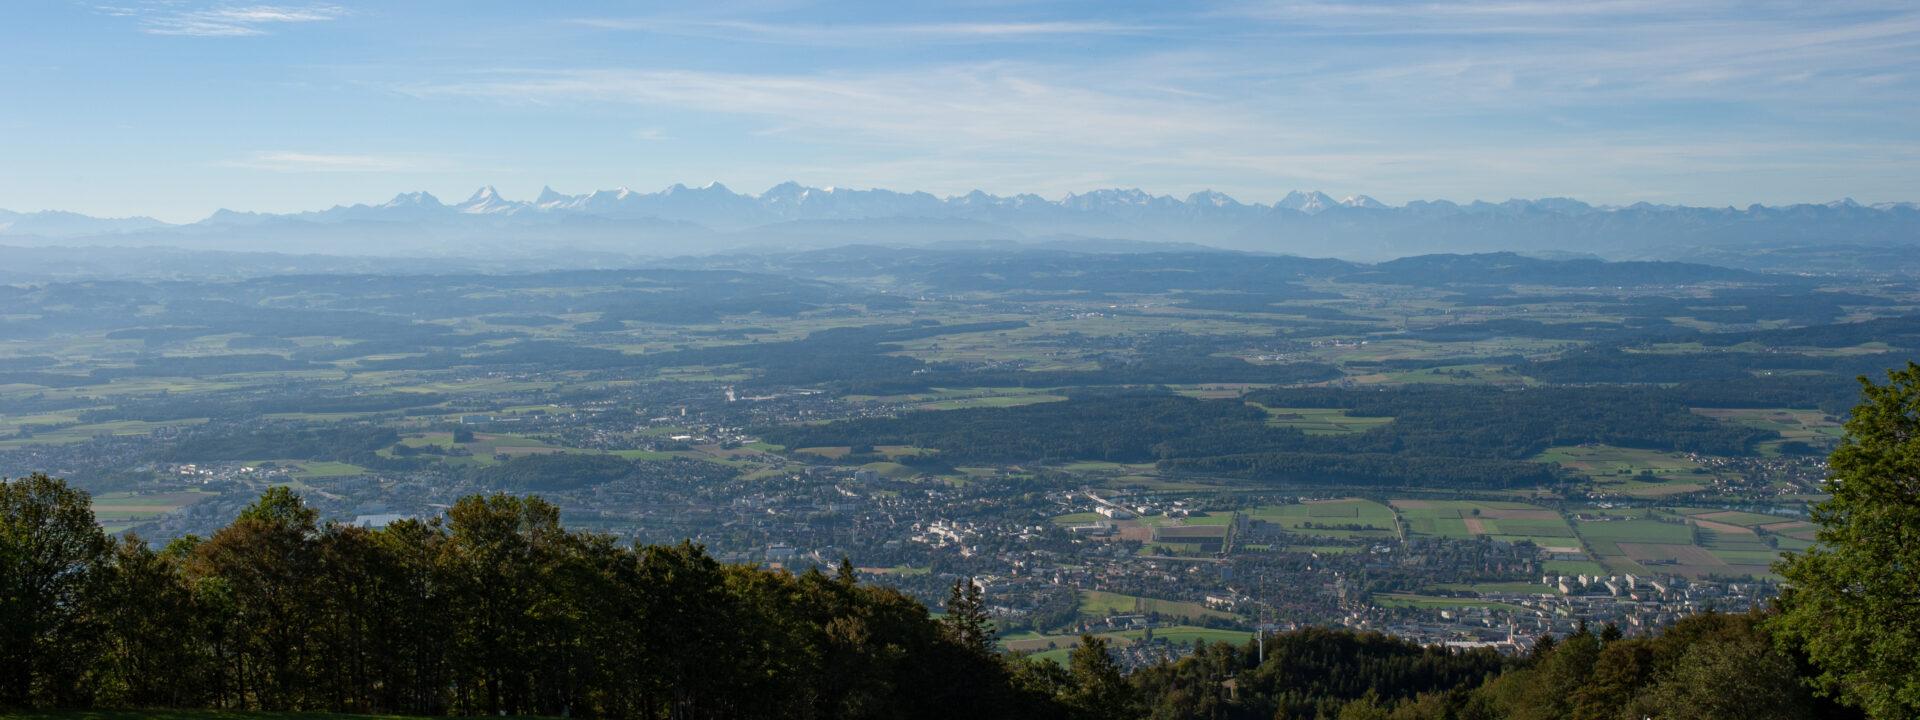 SommerSpass in Solothurn - Reise 2